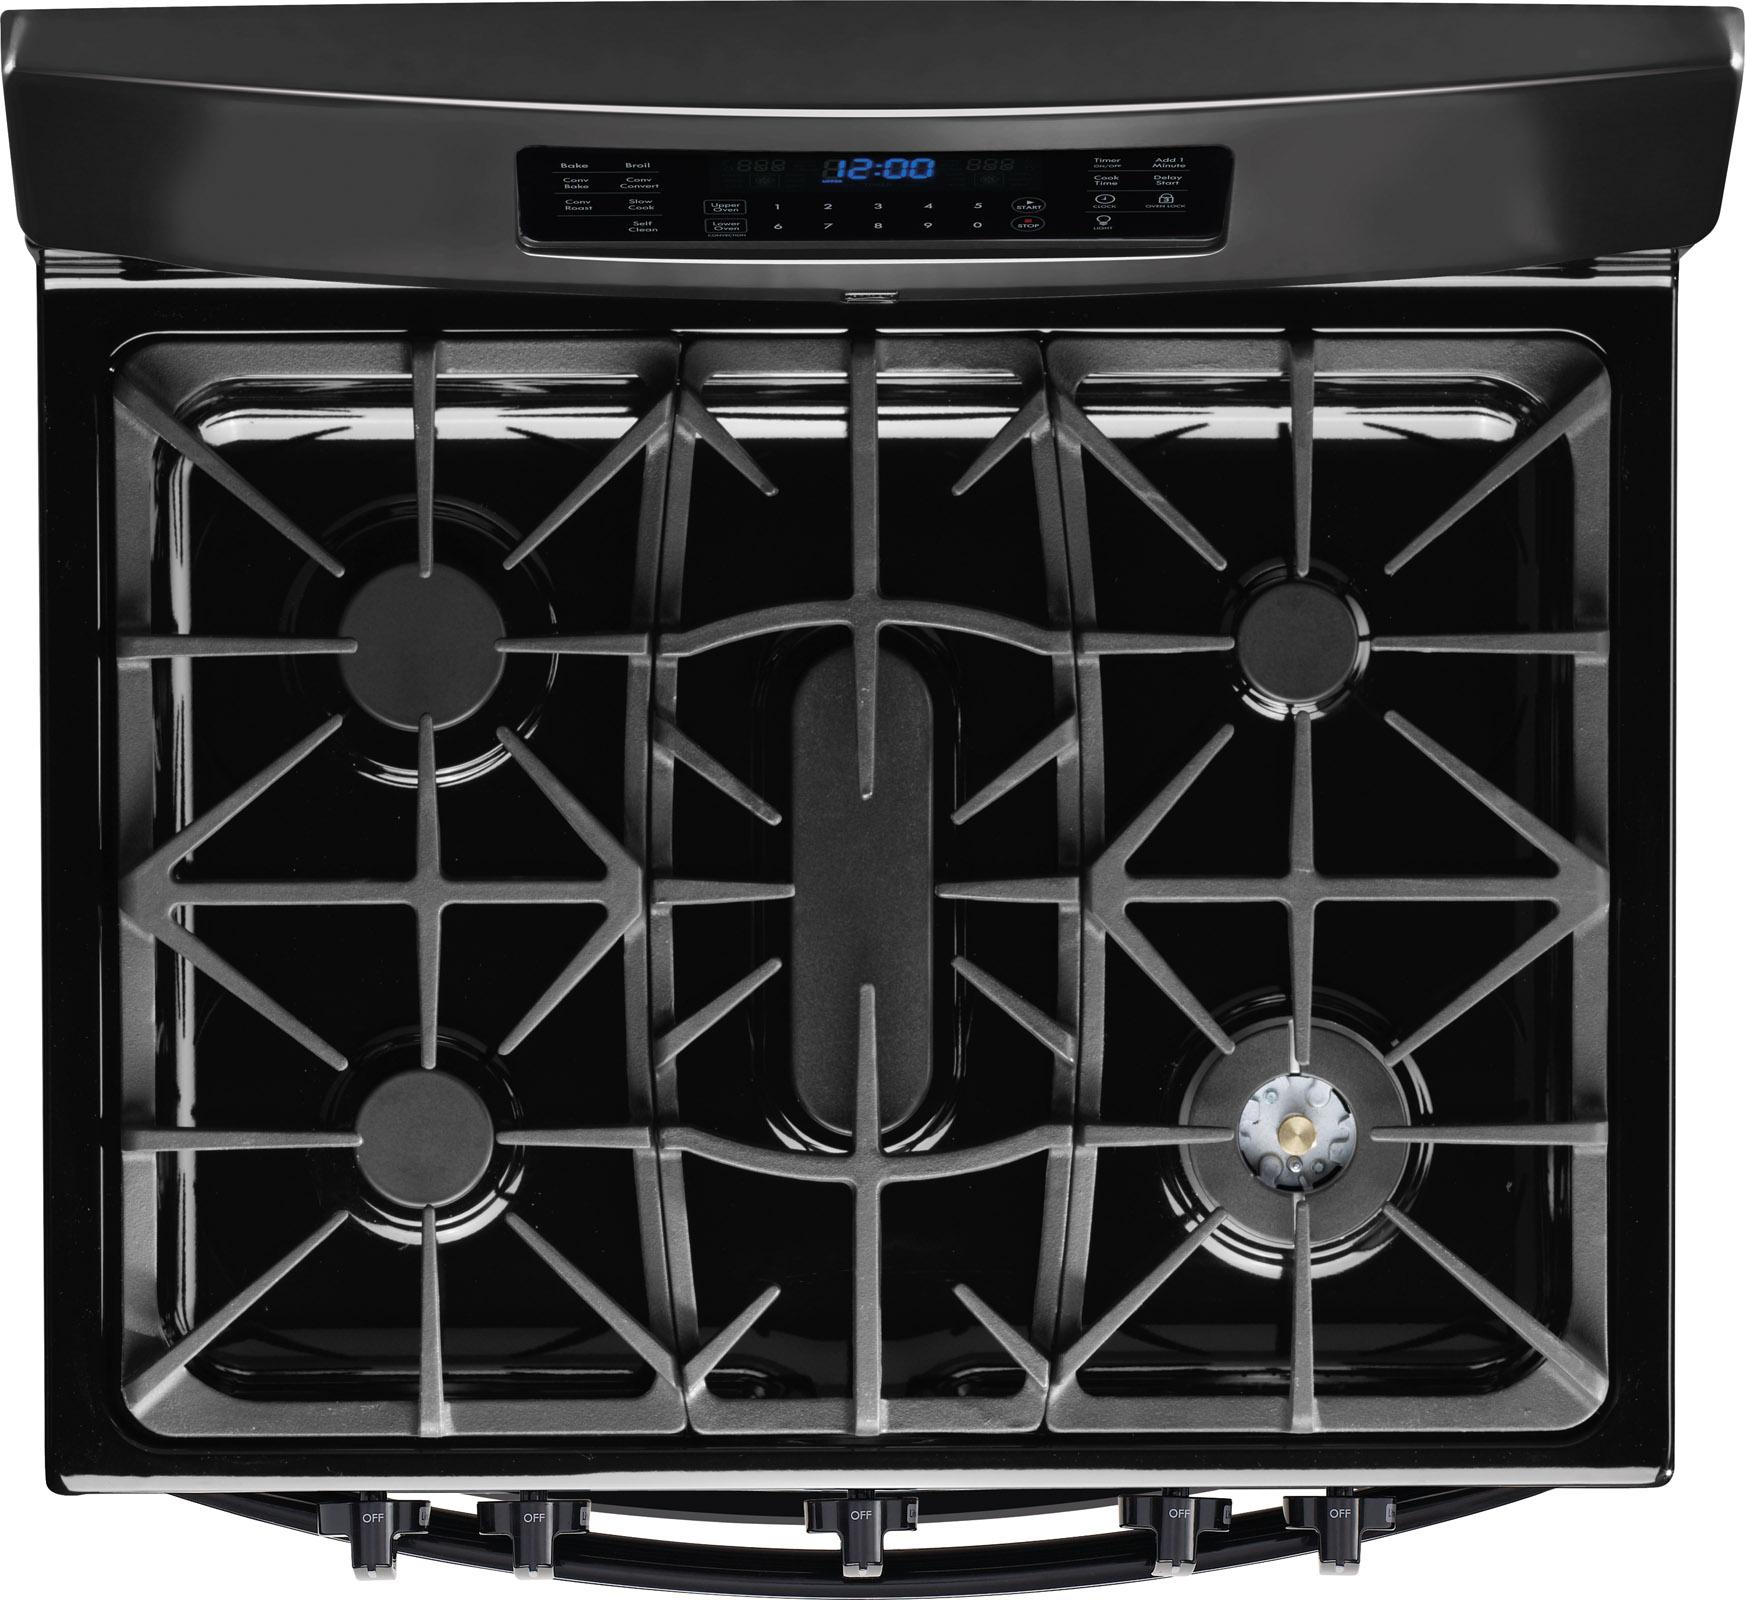 Kenmore Elite 75429 5.9 cu. ft. Double-Oven Gas Range - Black